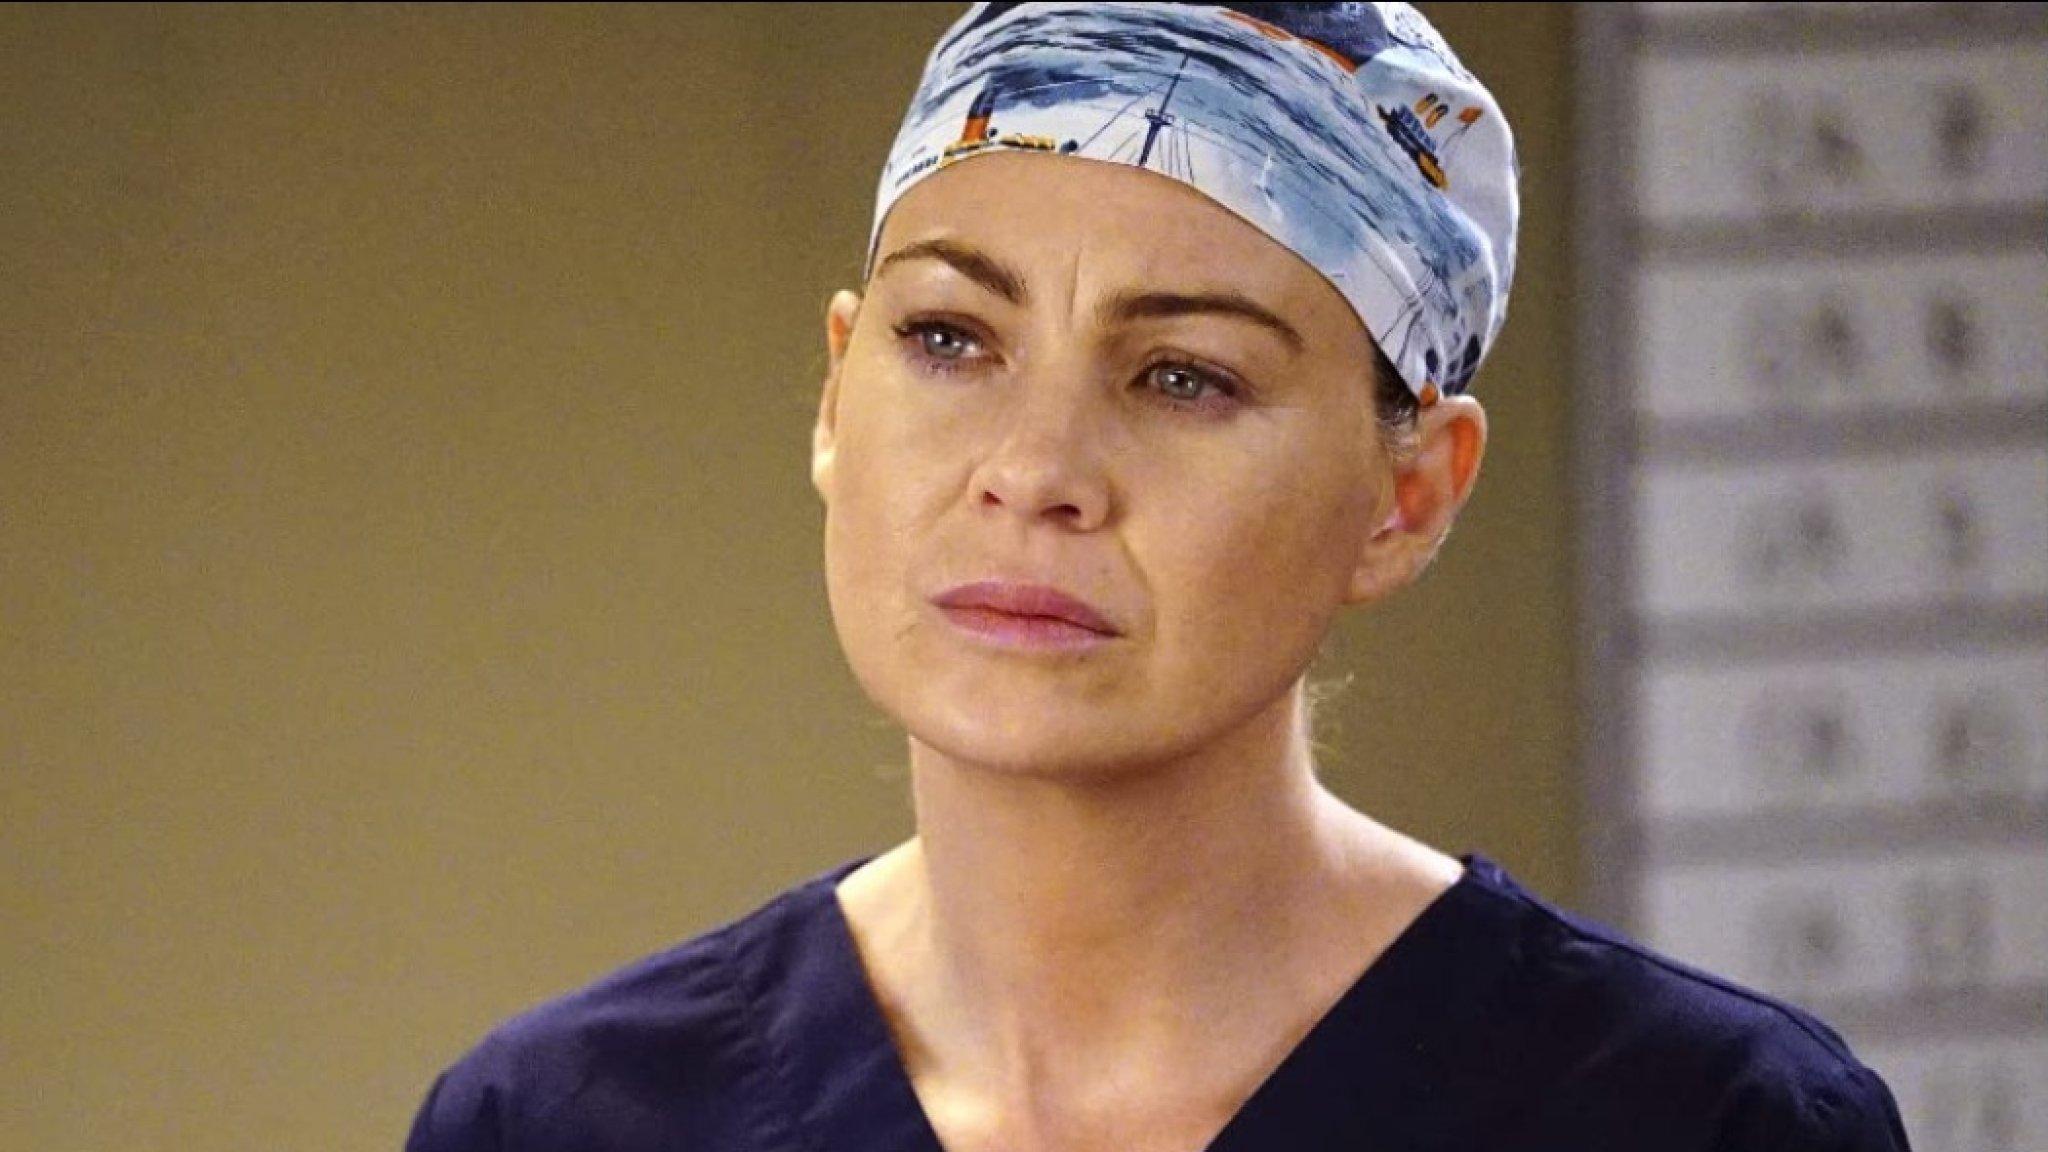 OMG: Grey's Anatomy neemt afscheid van dít hoofdpersonage - RTL Boulevard